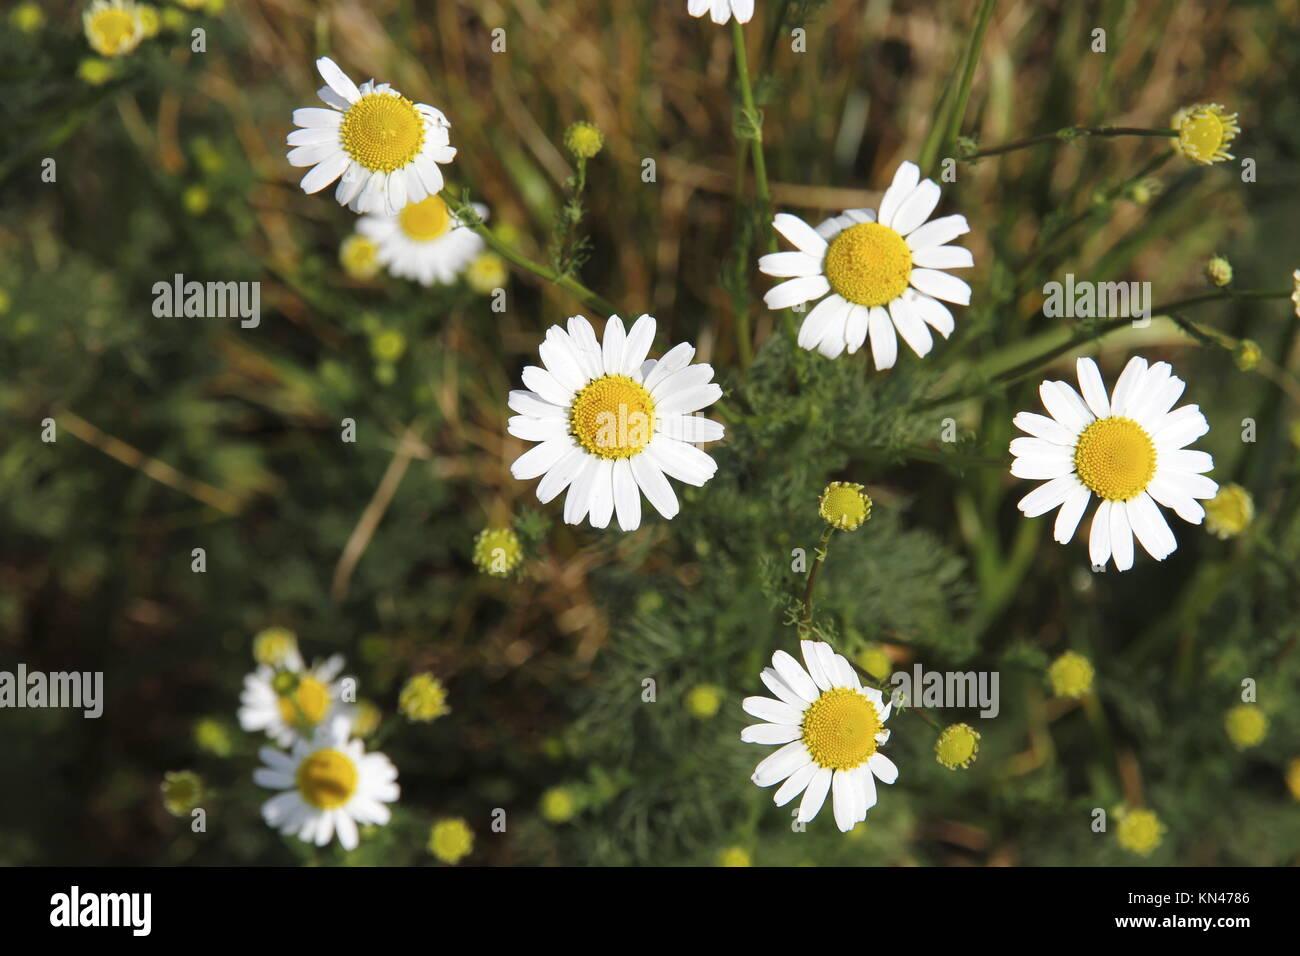 Photo of daisy flower stock photos photo of daisy flower stock photo of some wild daisy flowers stock image izmirmasajfo